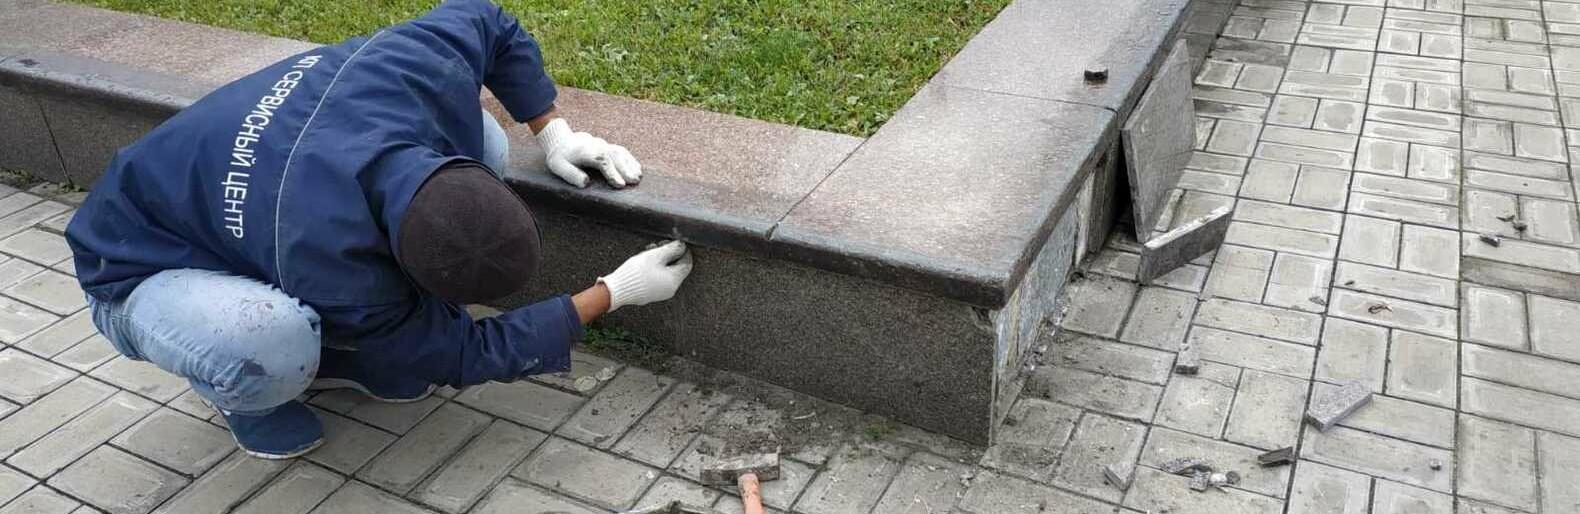 Вандалы разрисовали обелиск на площади 10 апреля в Одессе, - ФОТО0